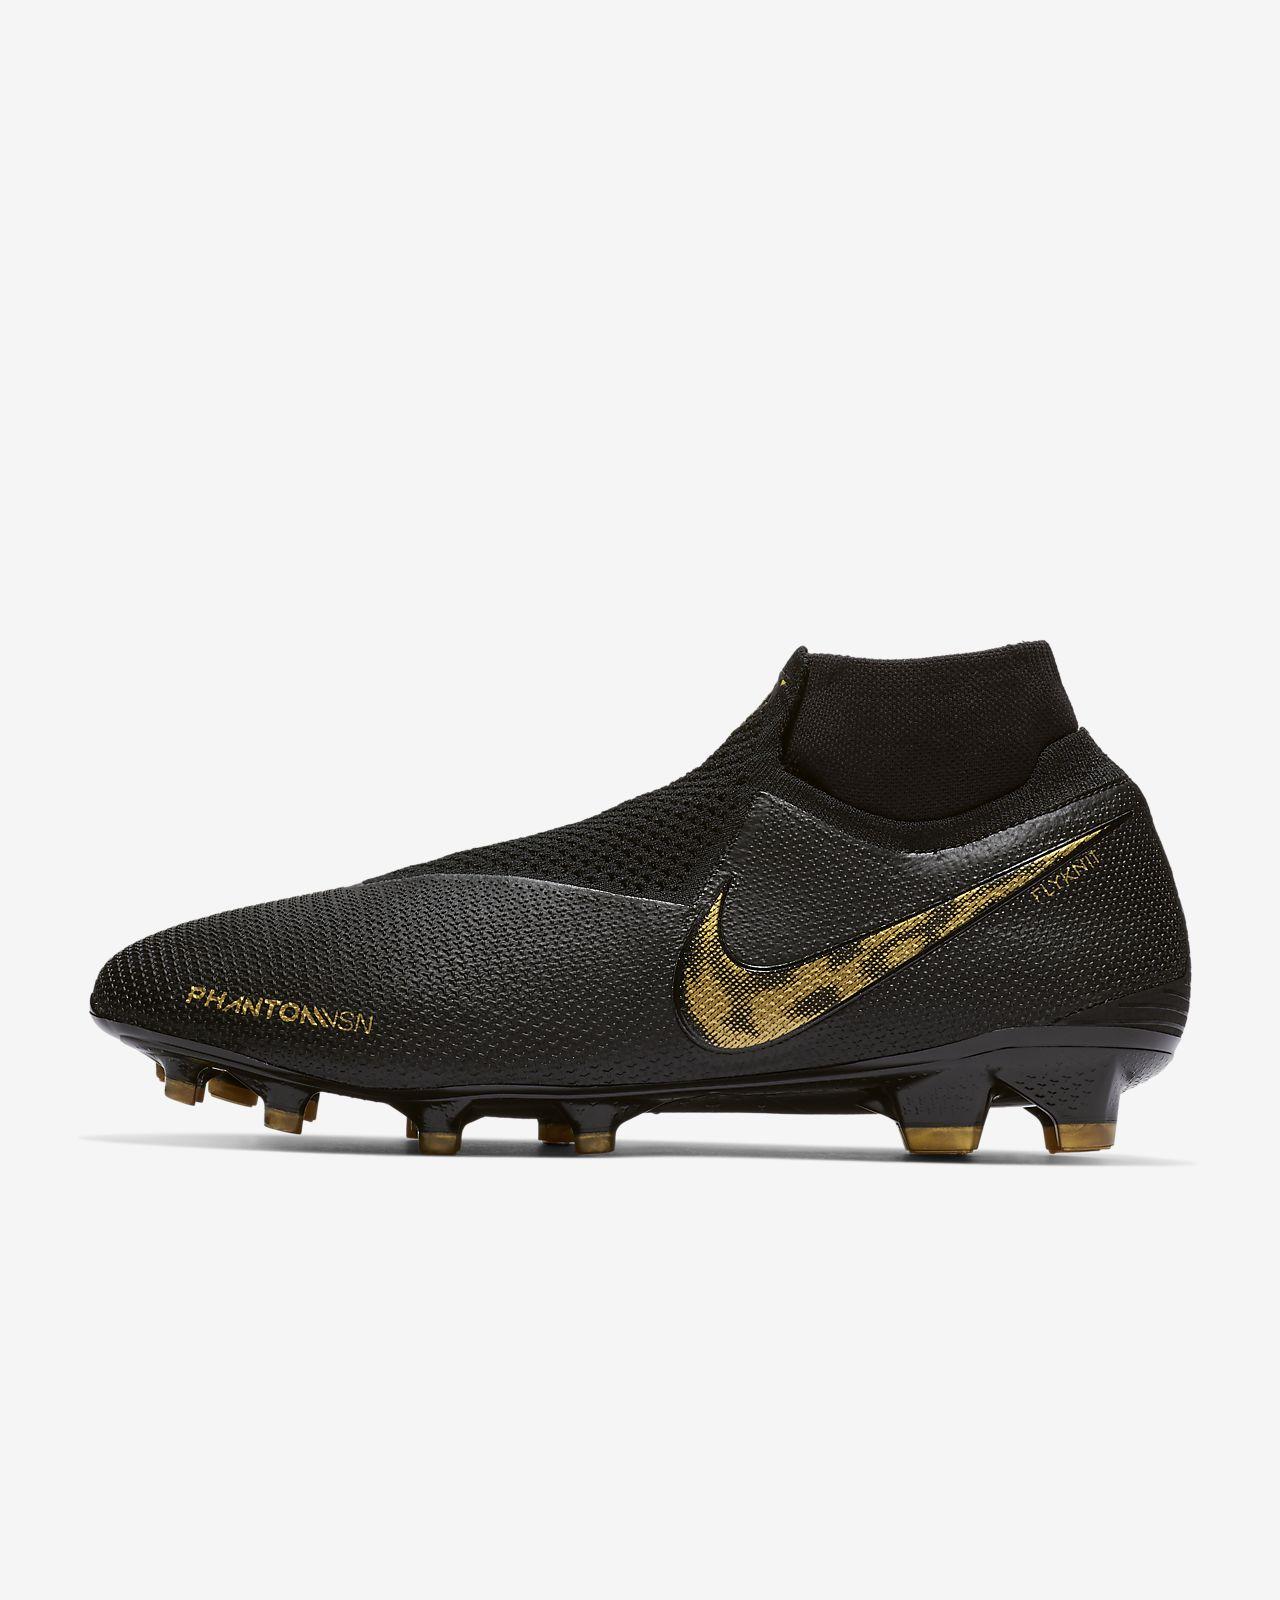 c24565e1e Nike Phantom Vision Elite Dynamic Fit FG Firm-Ground Football Boot ...